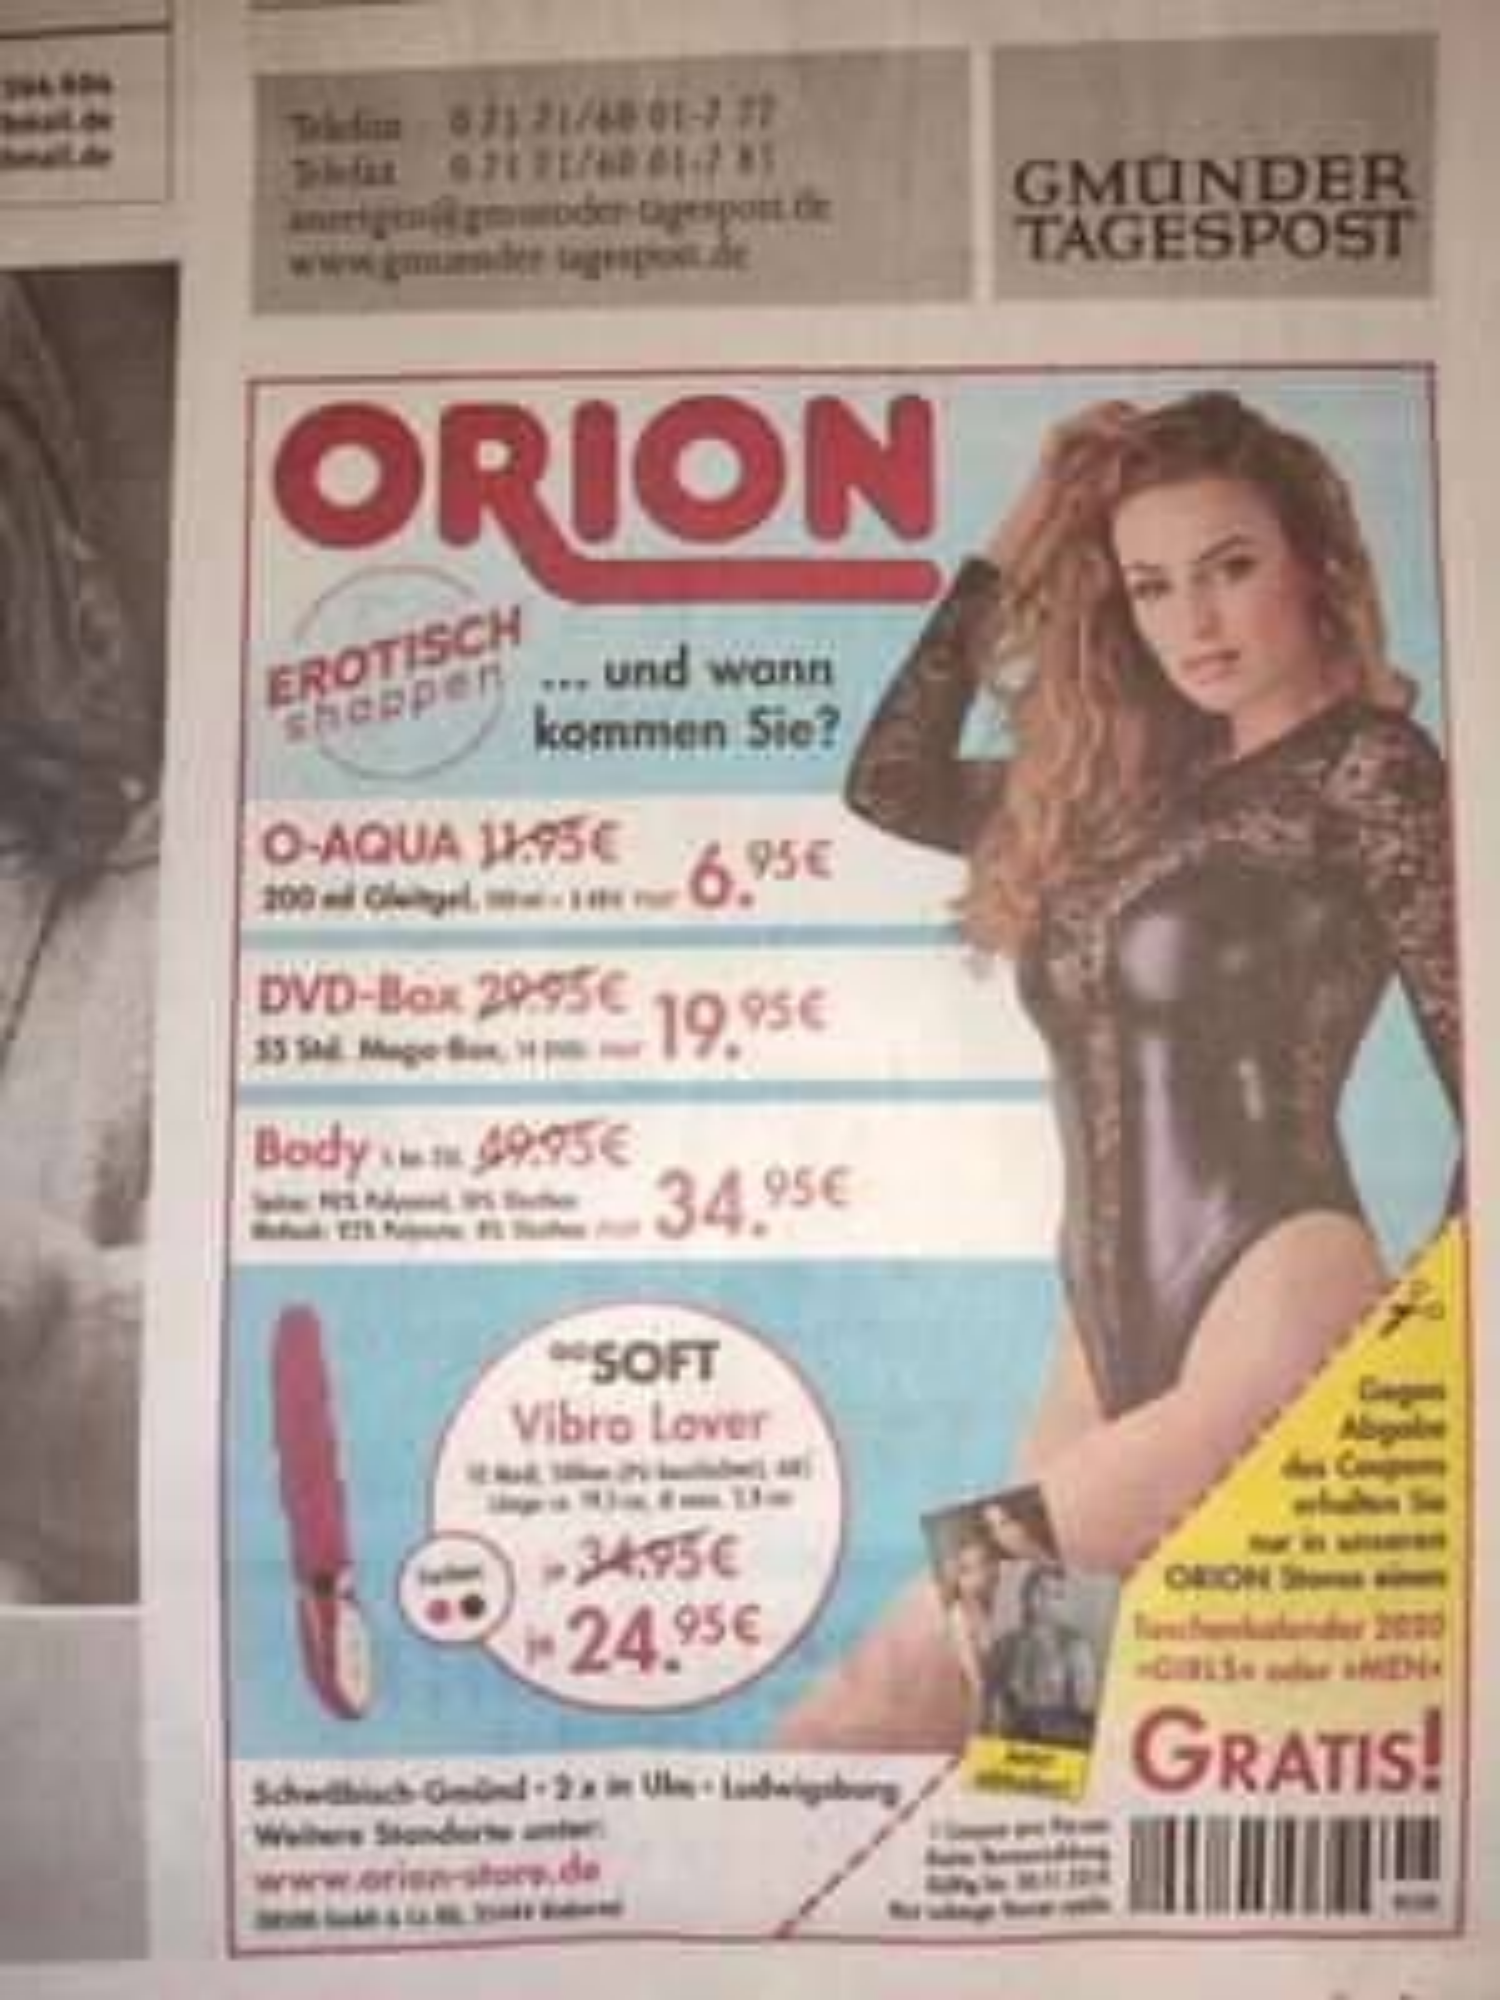 Gratis Erotikkalender bei Orion